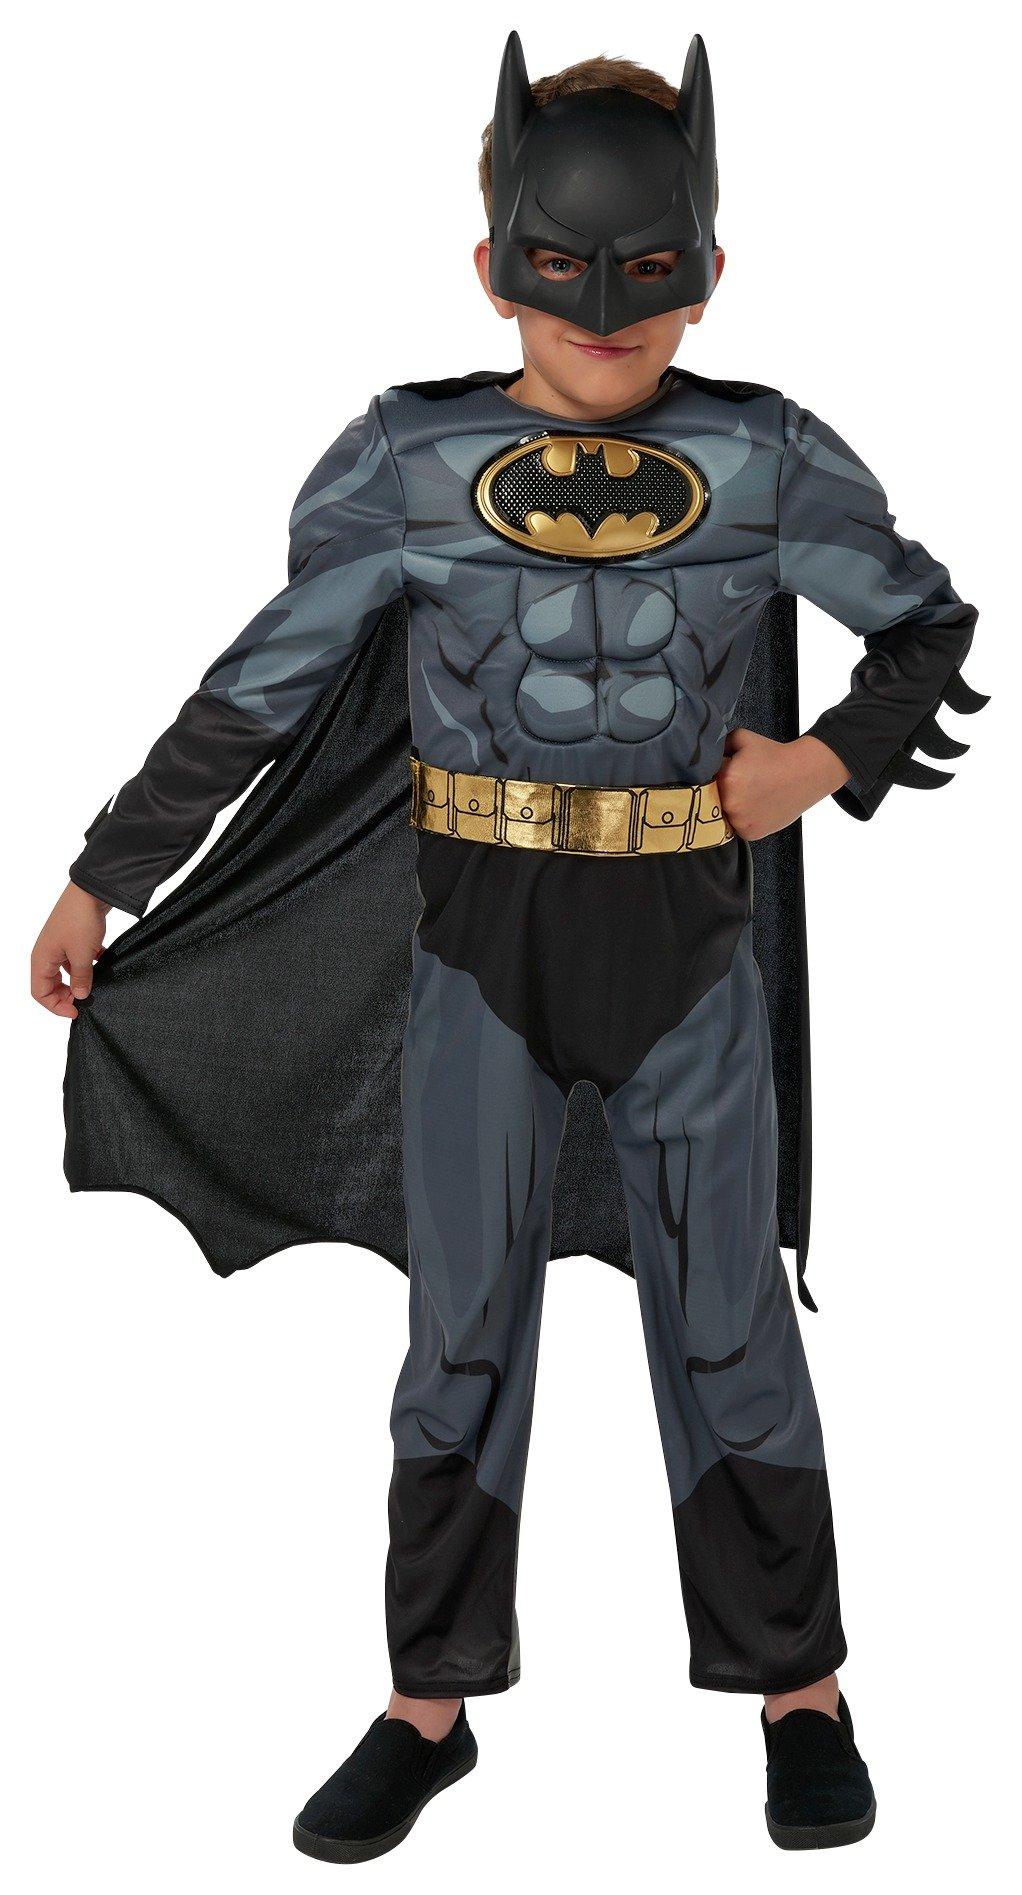 Image of DC Batman Fancy Dress Costume - 5-6 Years